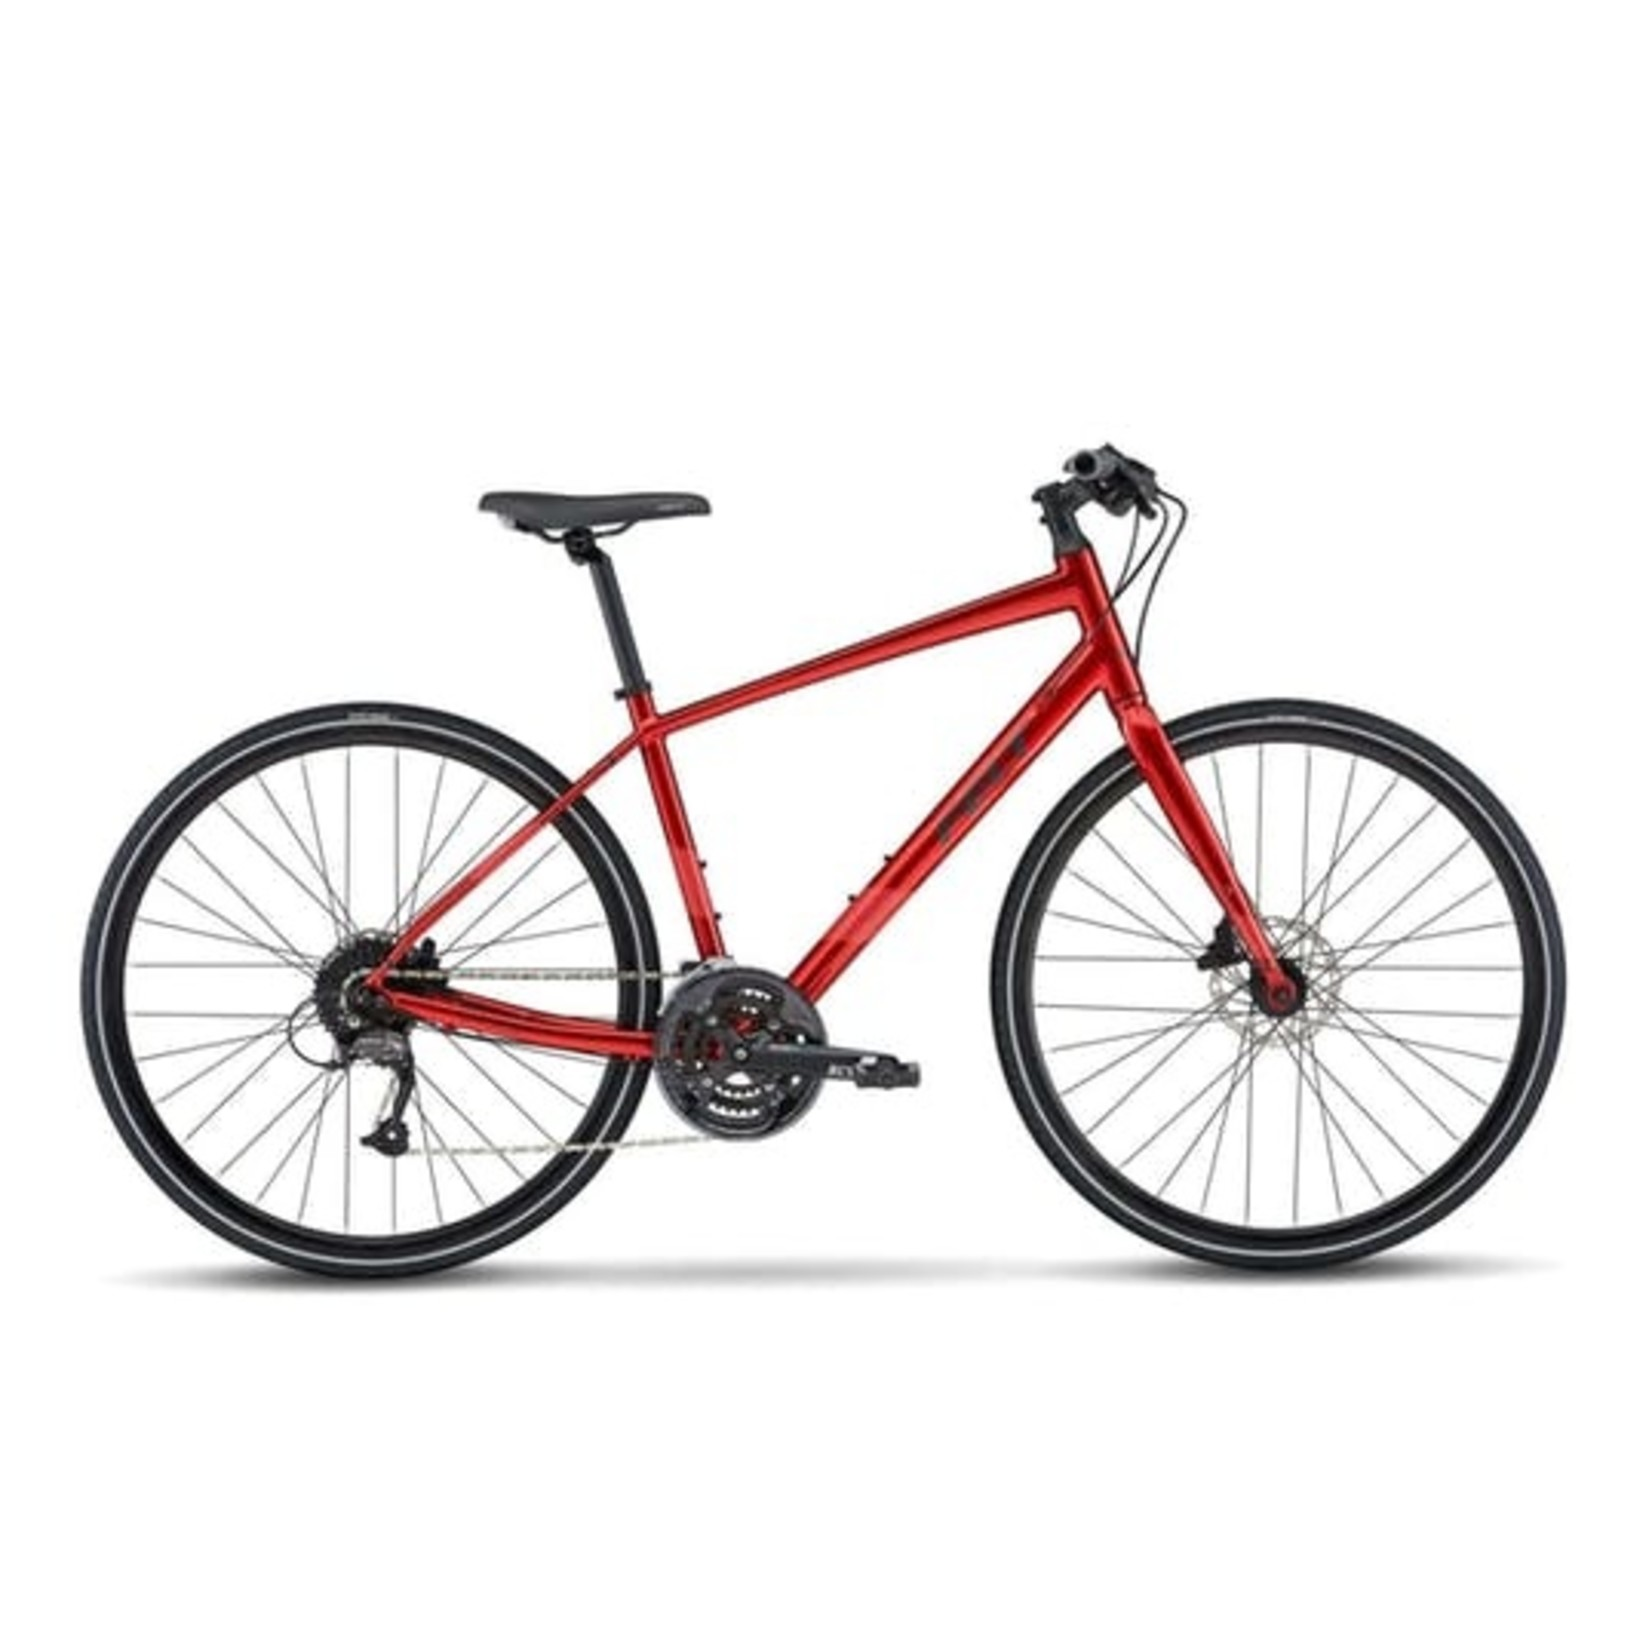 FELT Felt Verza Speed 40 Red XL 54 cm